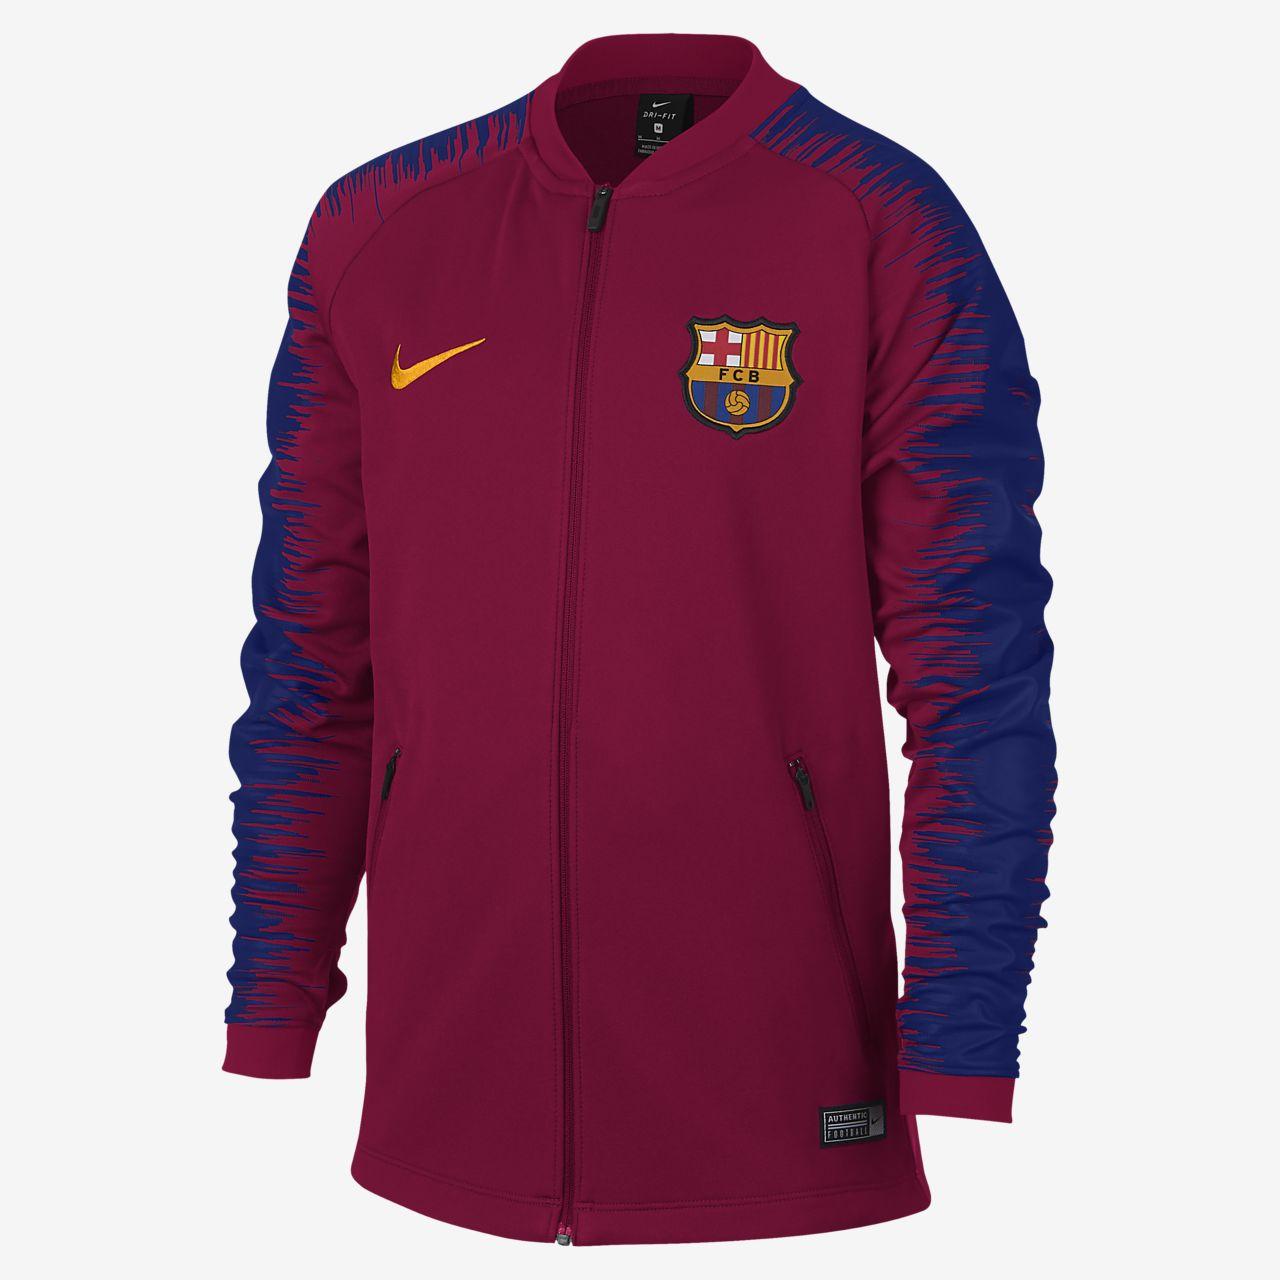 Chamarra de fútbol para niños talla grande FC Barcelona Anthem. Nike ... 5cdf0210aa9